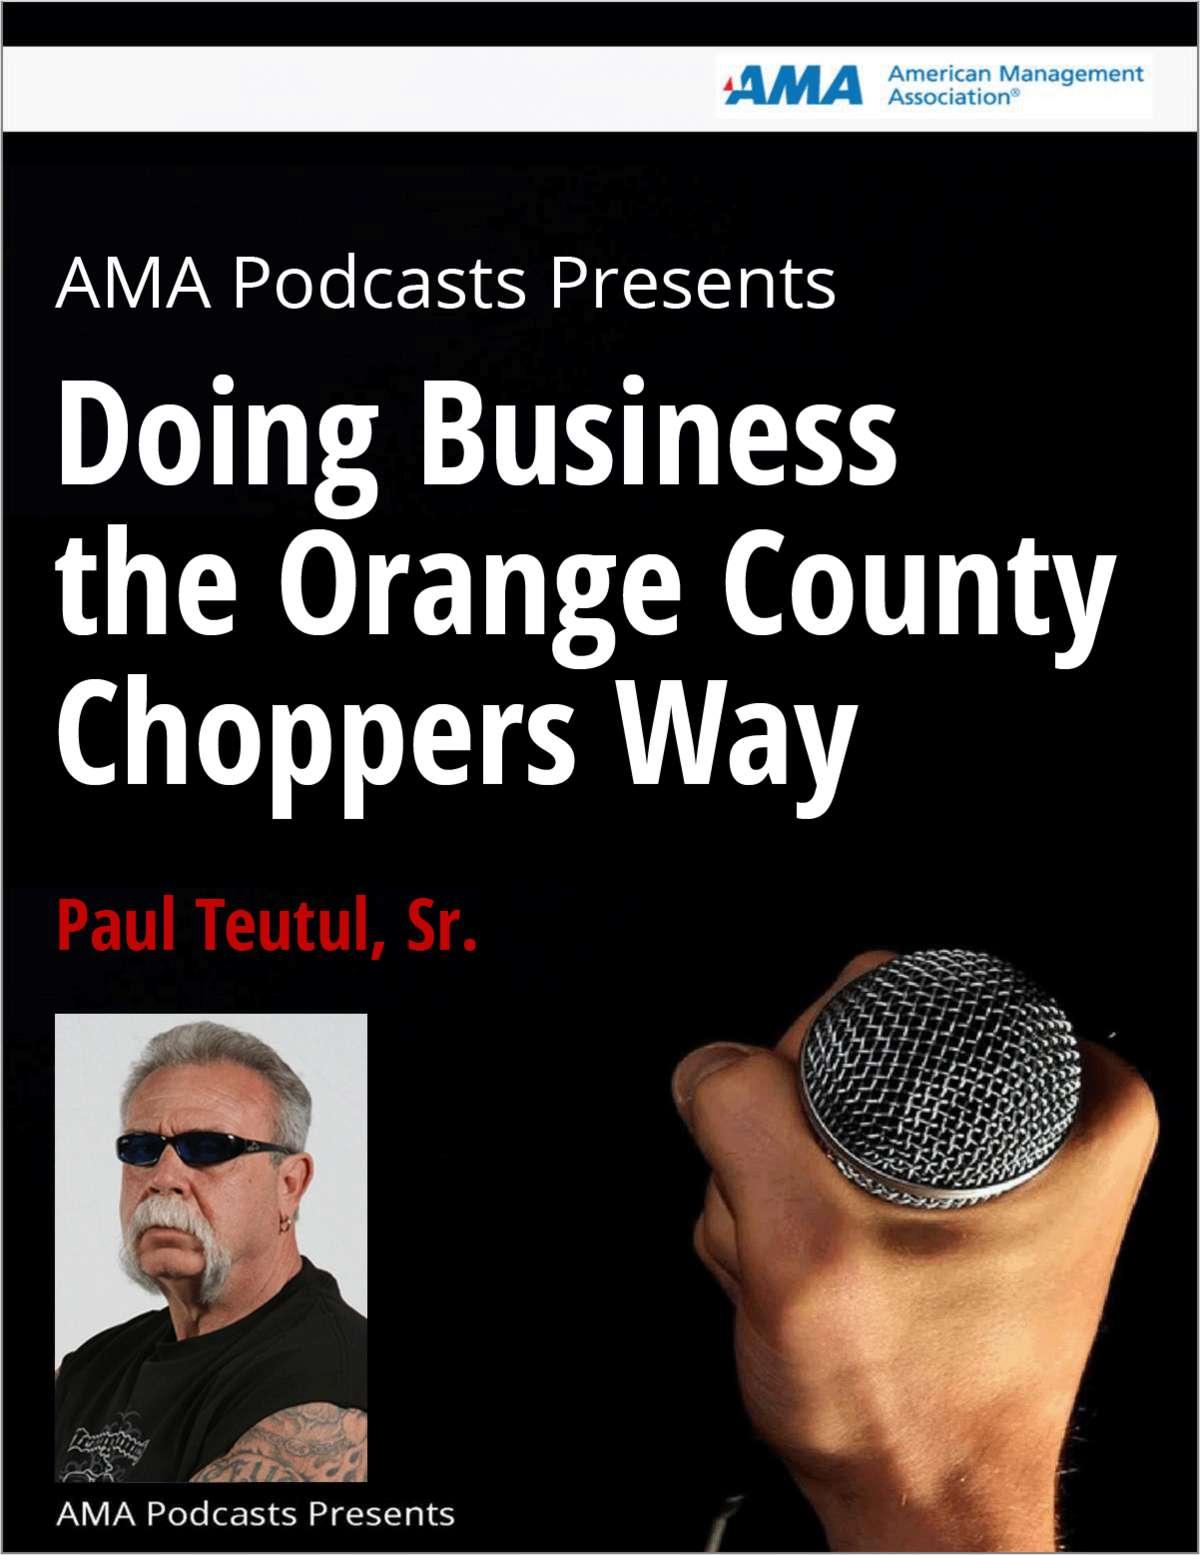 Paul Teutul, Sr. on Doing Business the Orange County Choppers Way